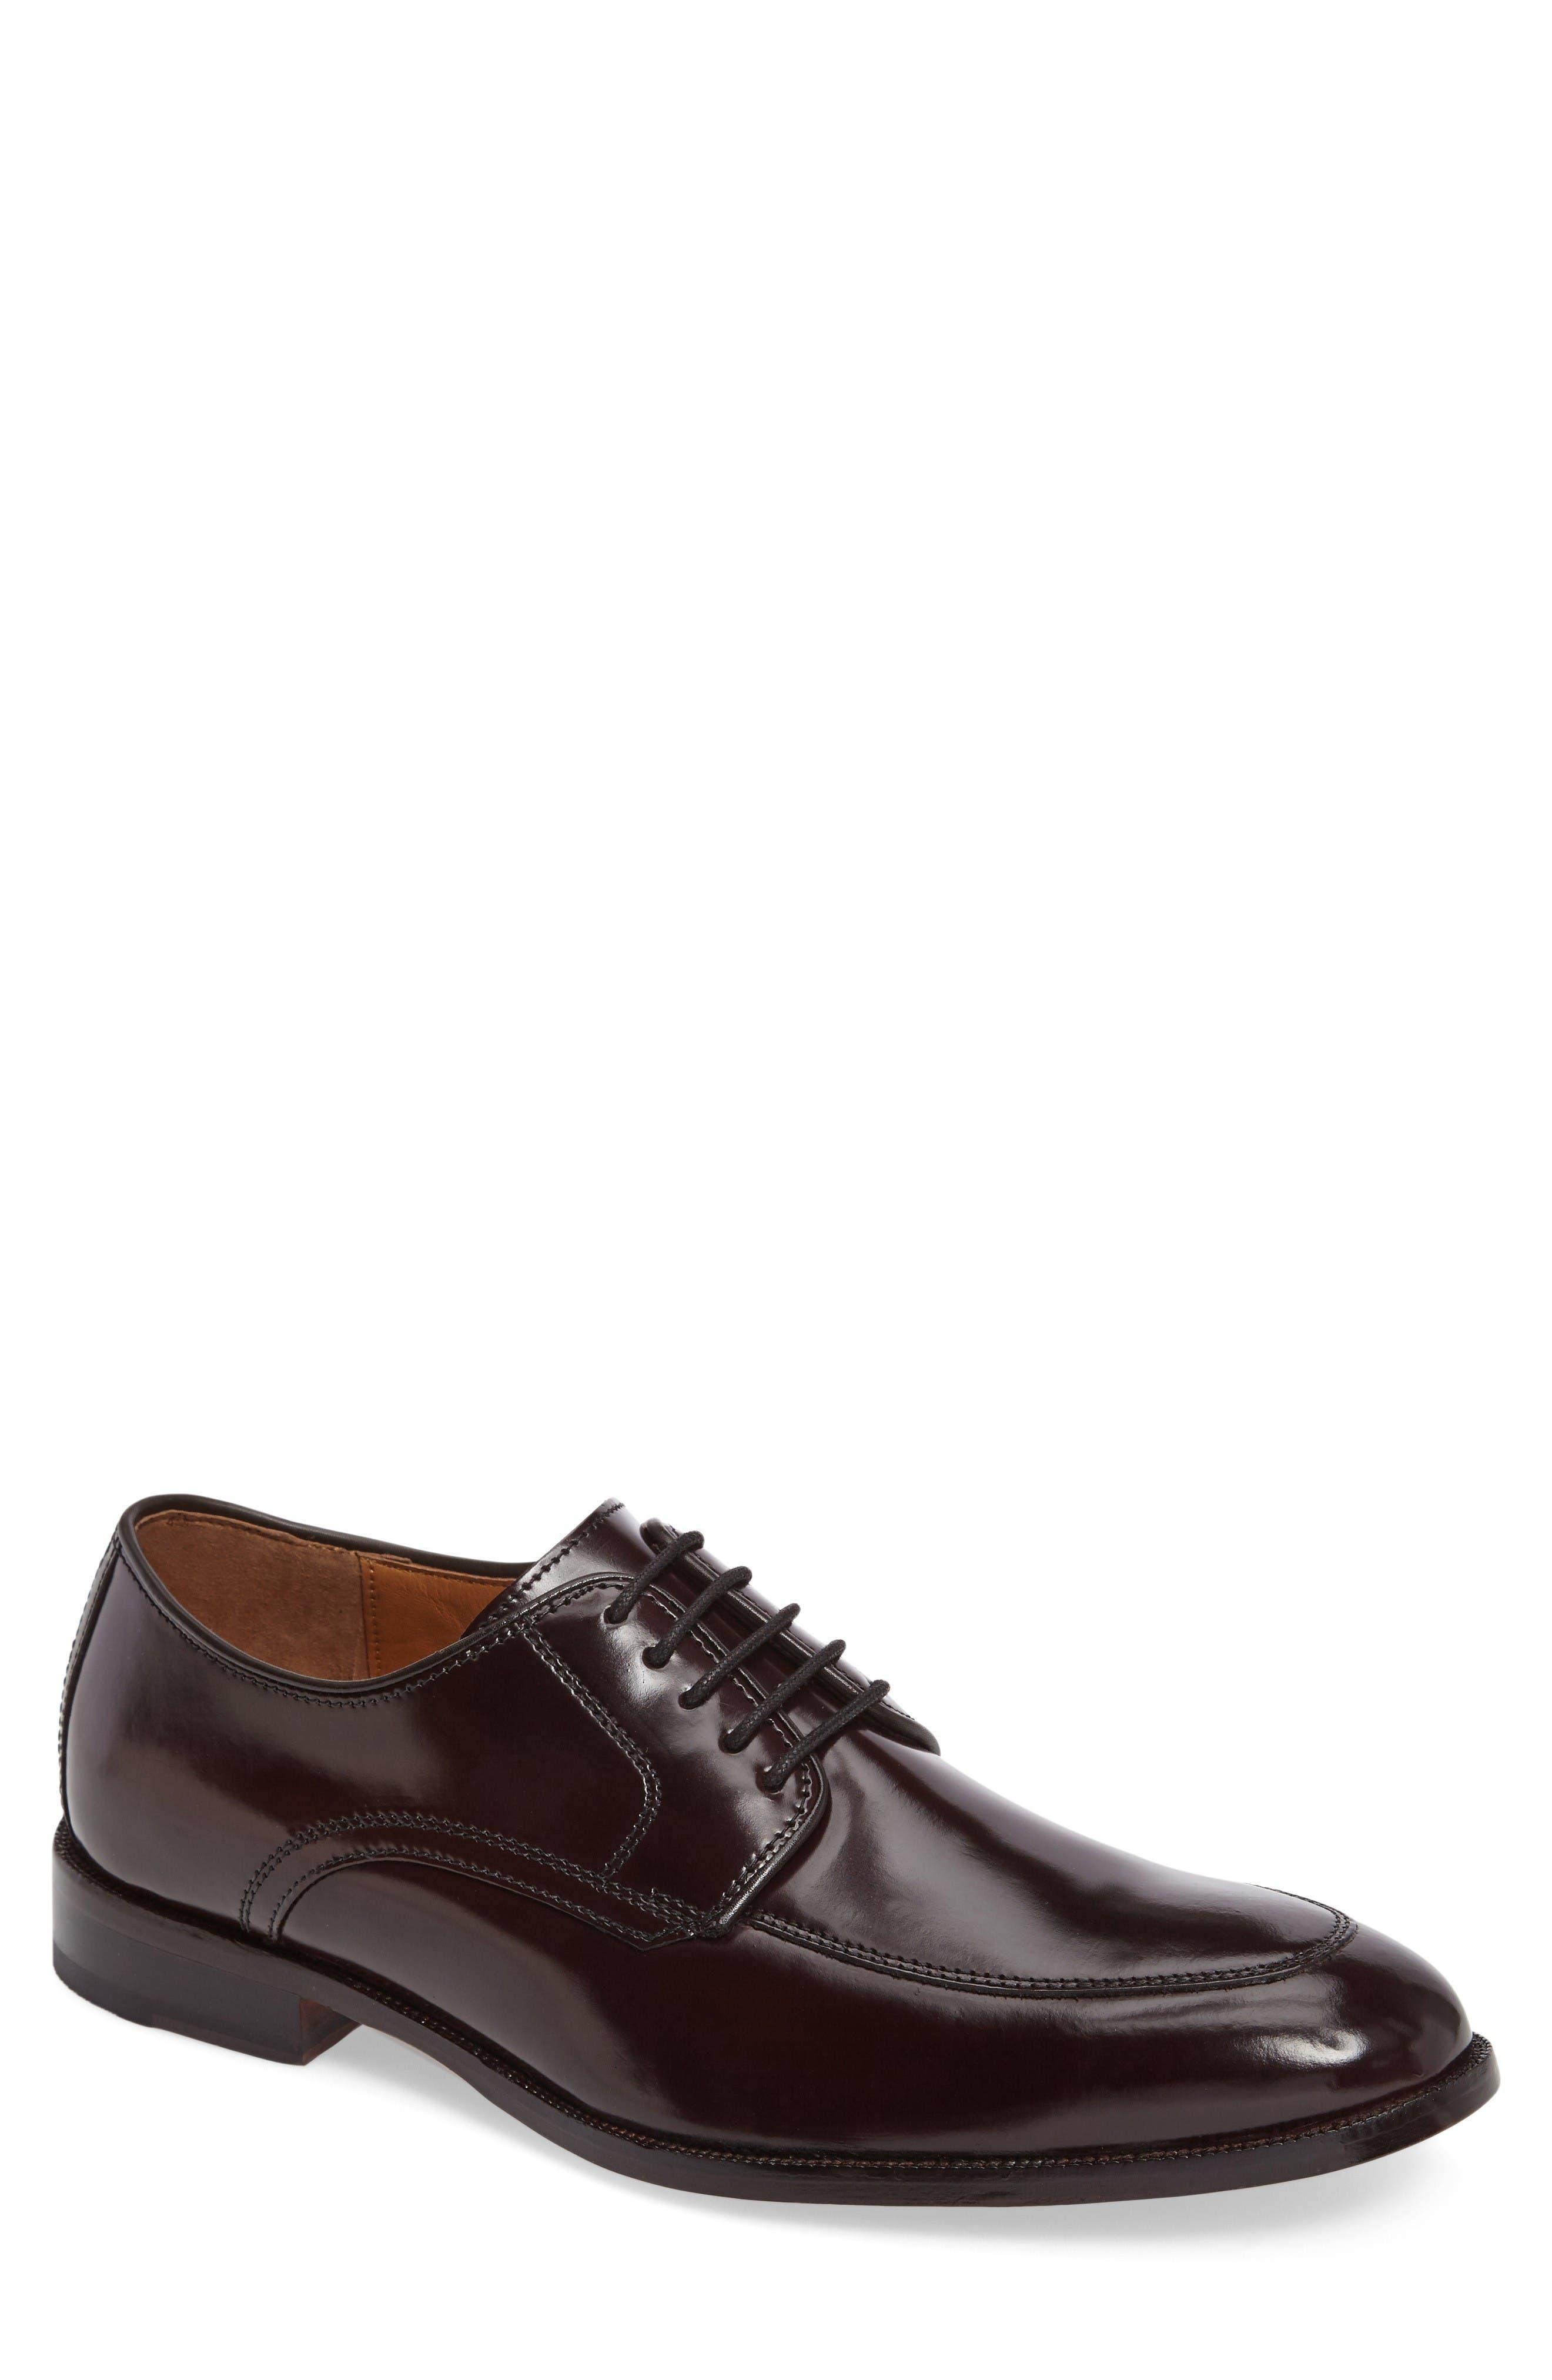 Bradford Apron-Toe Oxford,                         Main,                         color, Burgundy Leather